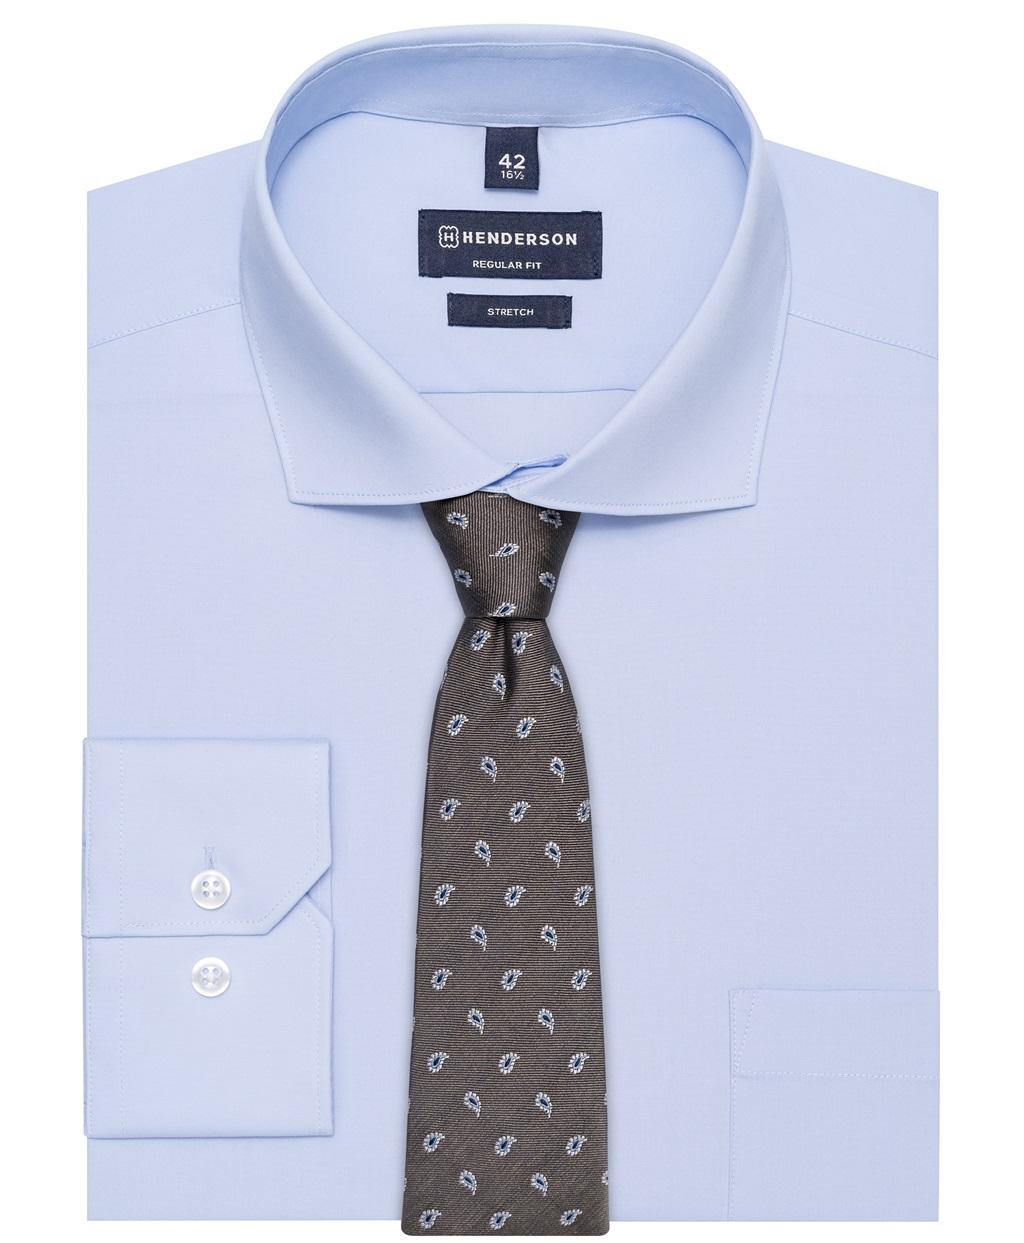 Рубашка прямой силуэт HENDERSON SHL-2843-N BLUE фото